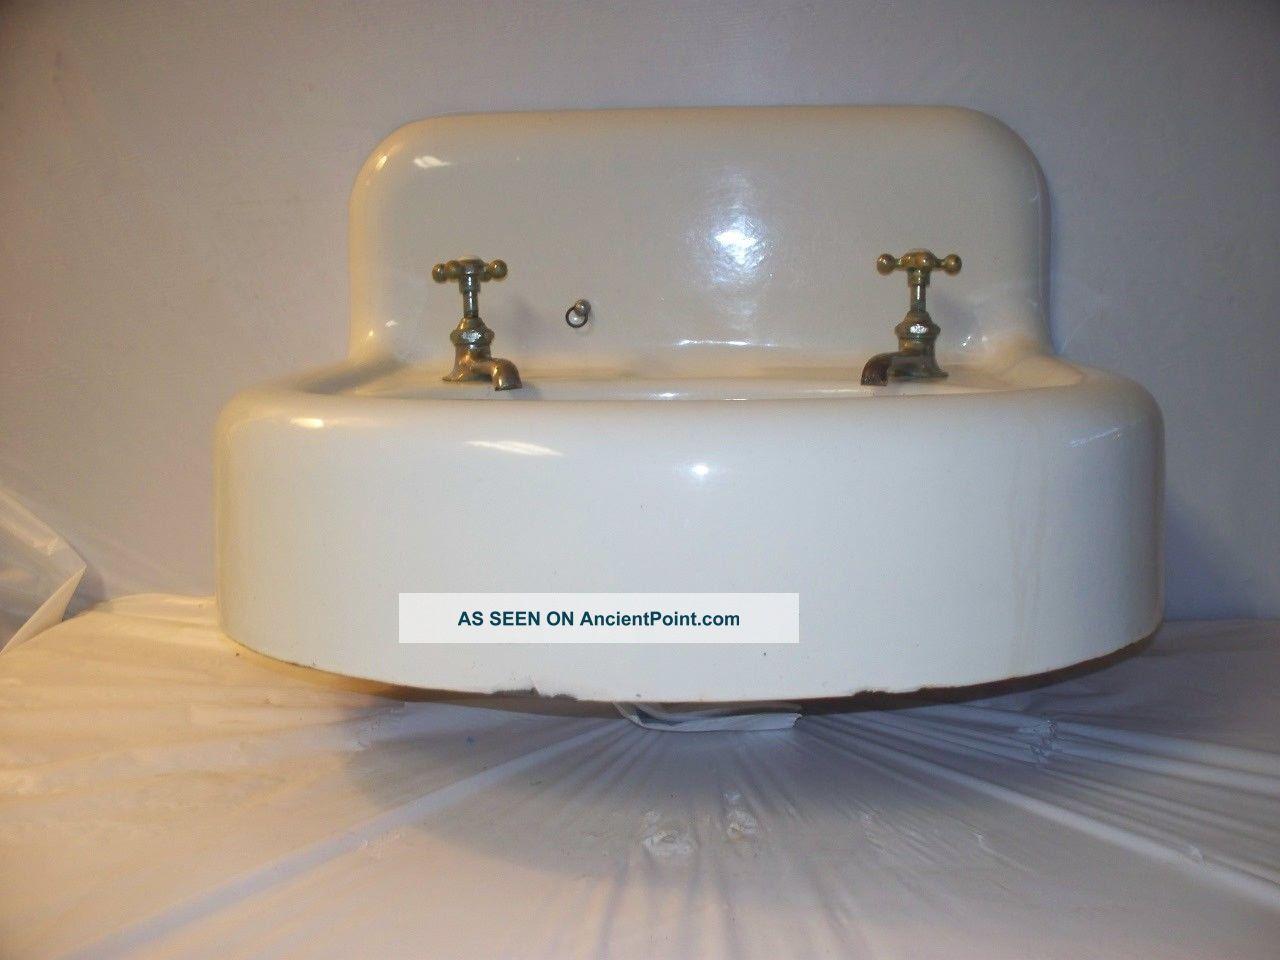 ... Cast Iron Bathroom Sink - Wall Mount - High Backsplash Sinks photo 1